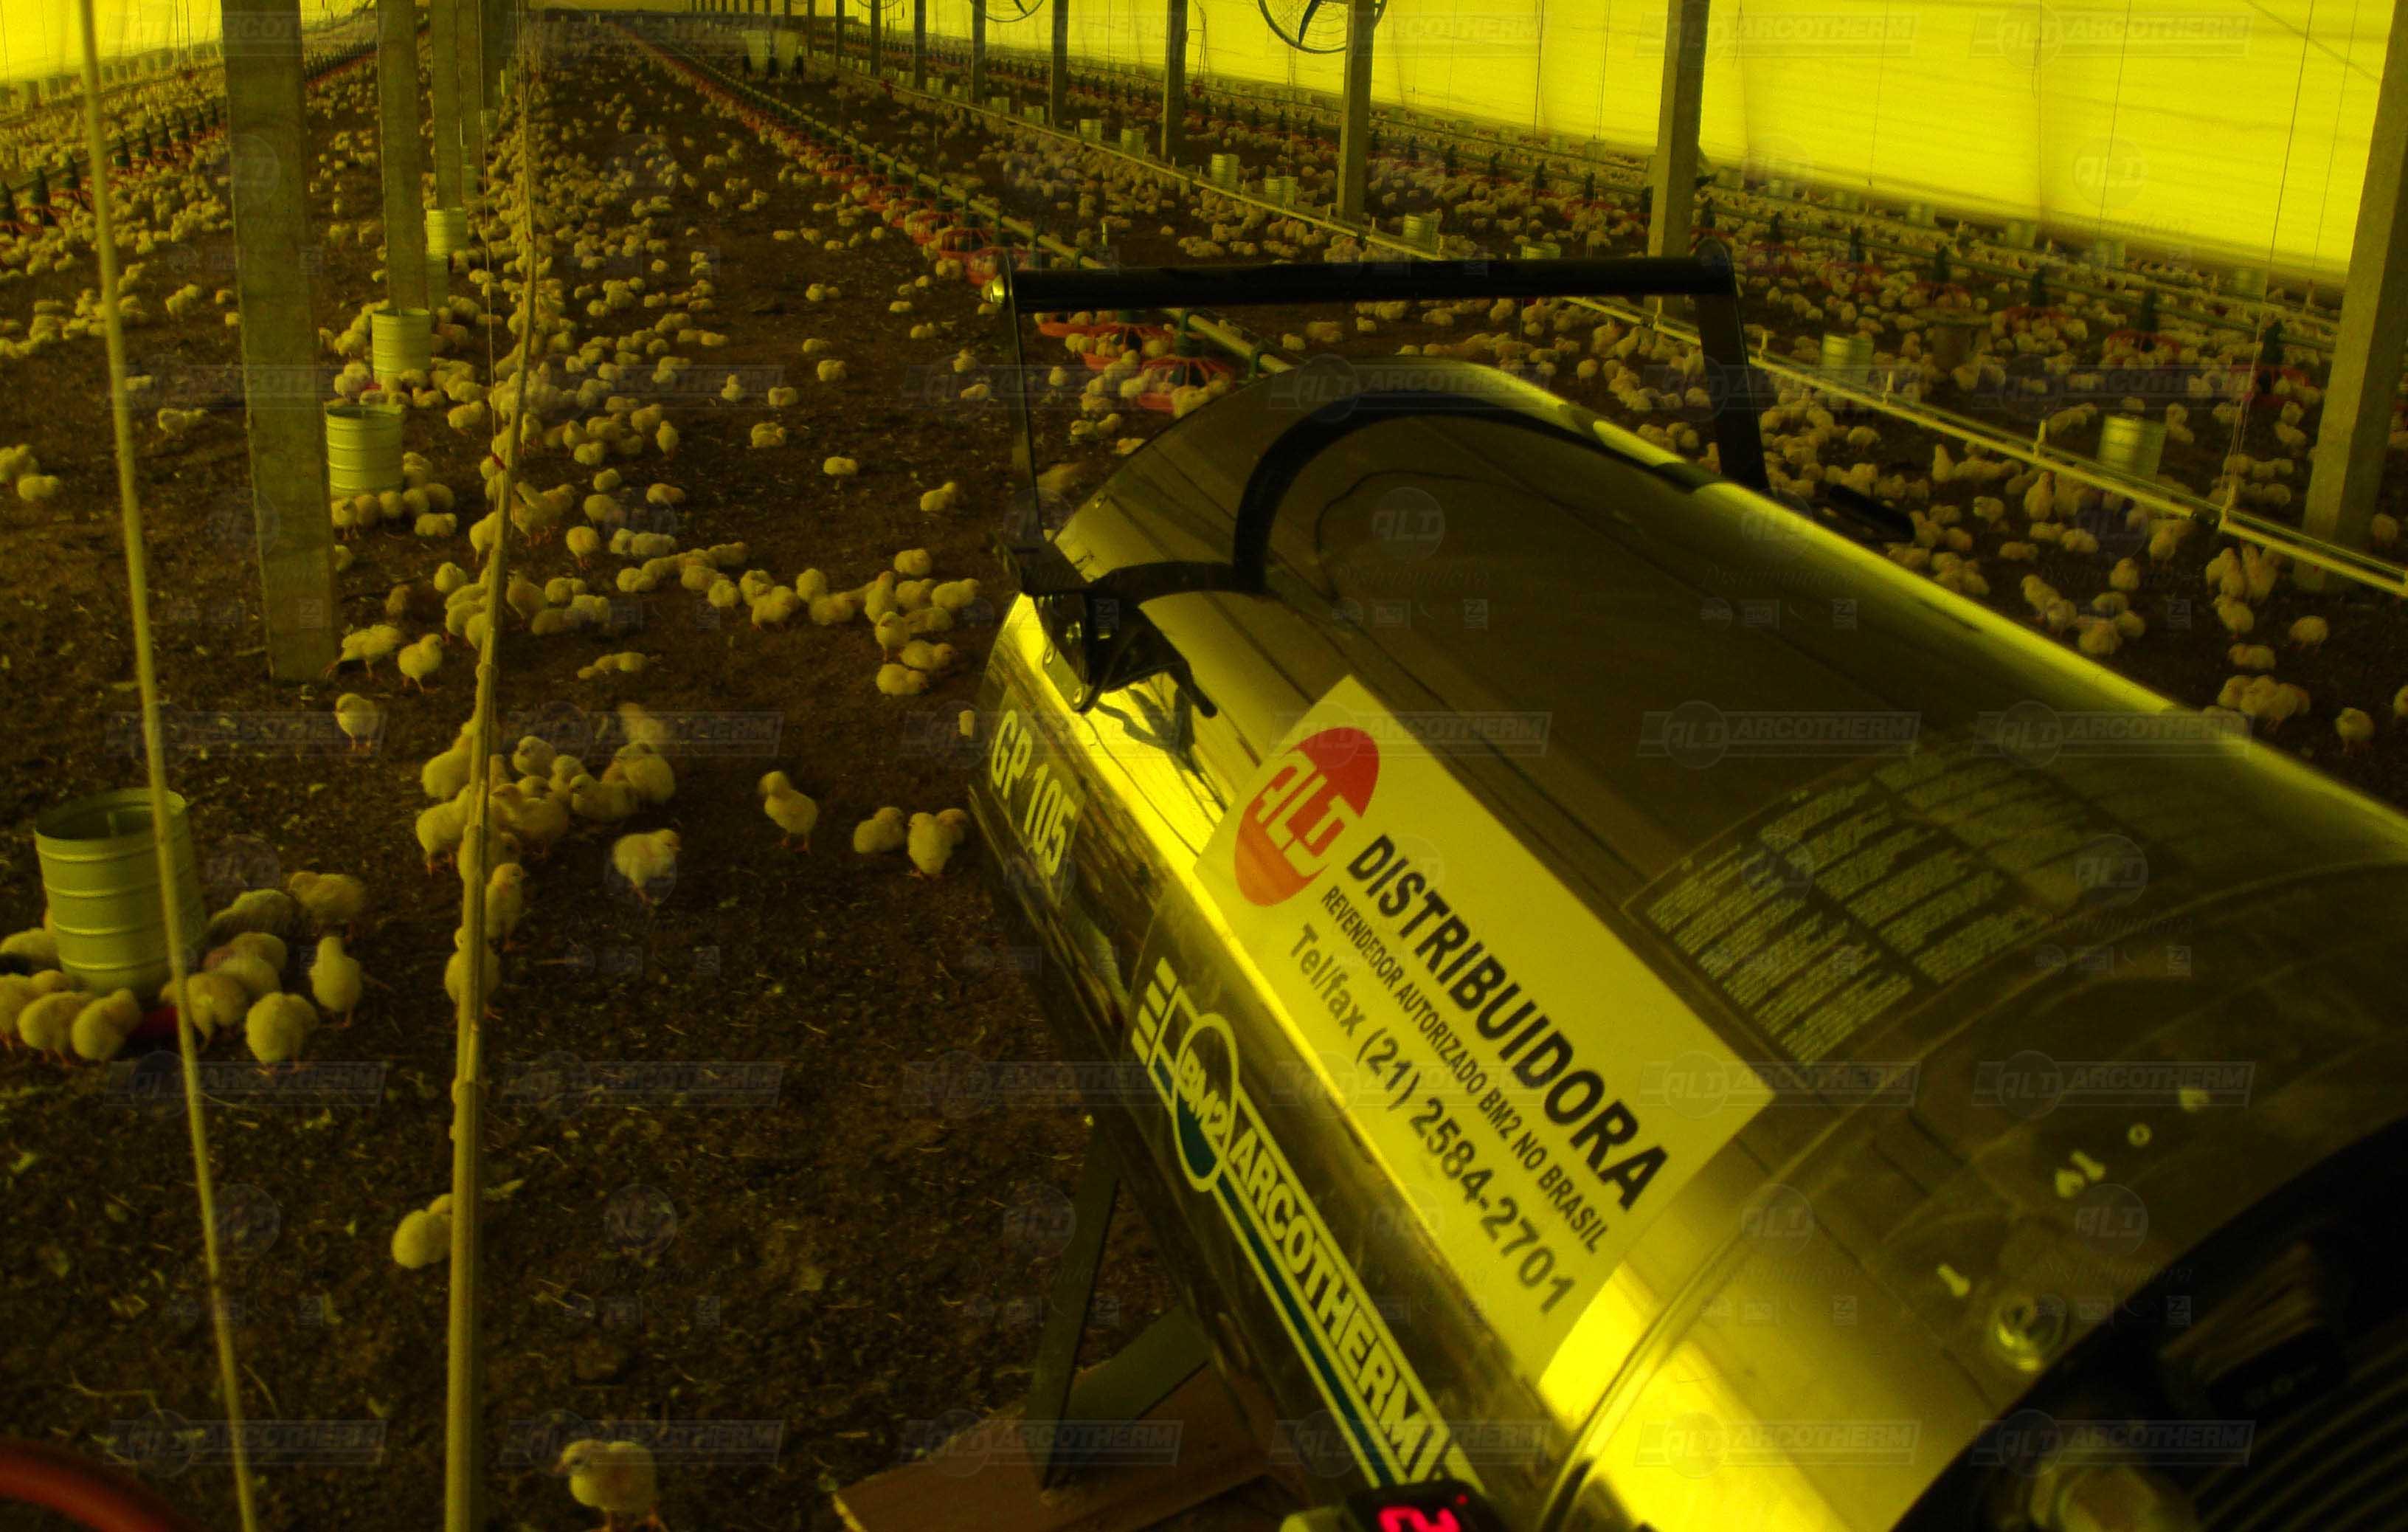 Granja - galpao frango de corte - aquecedor - gerador de ar quente - arcotherm- 6